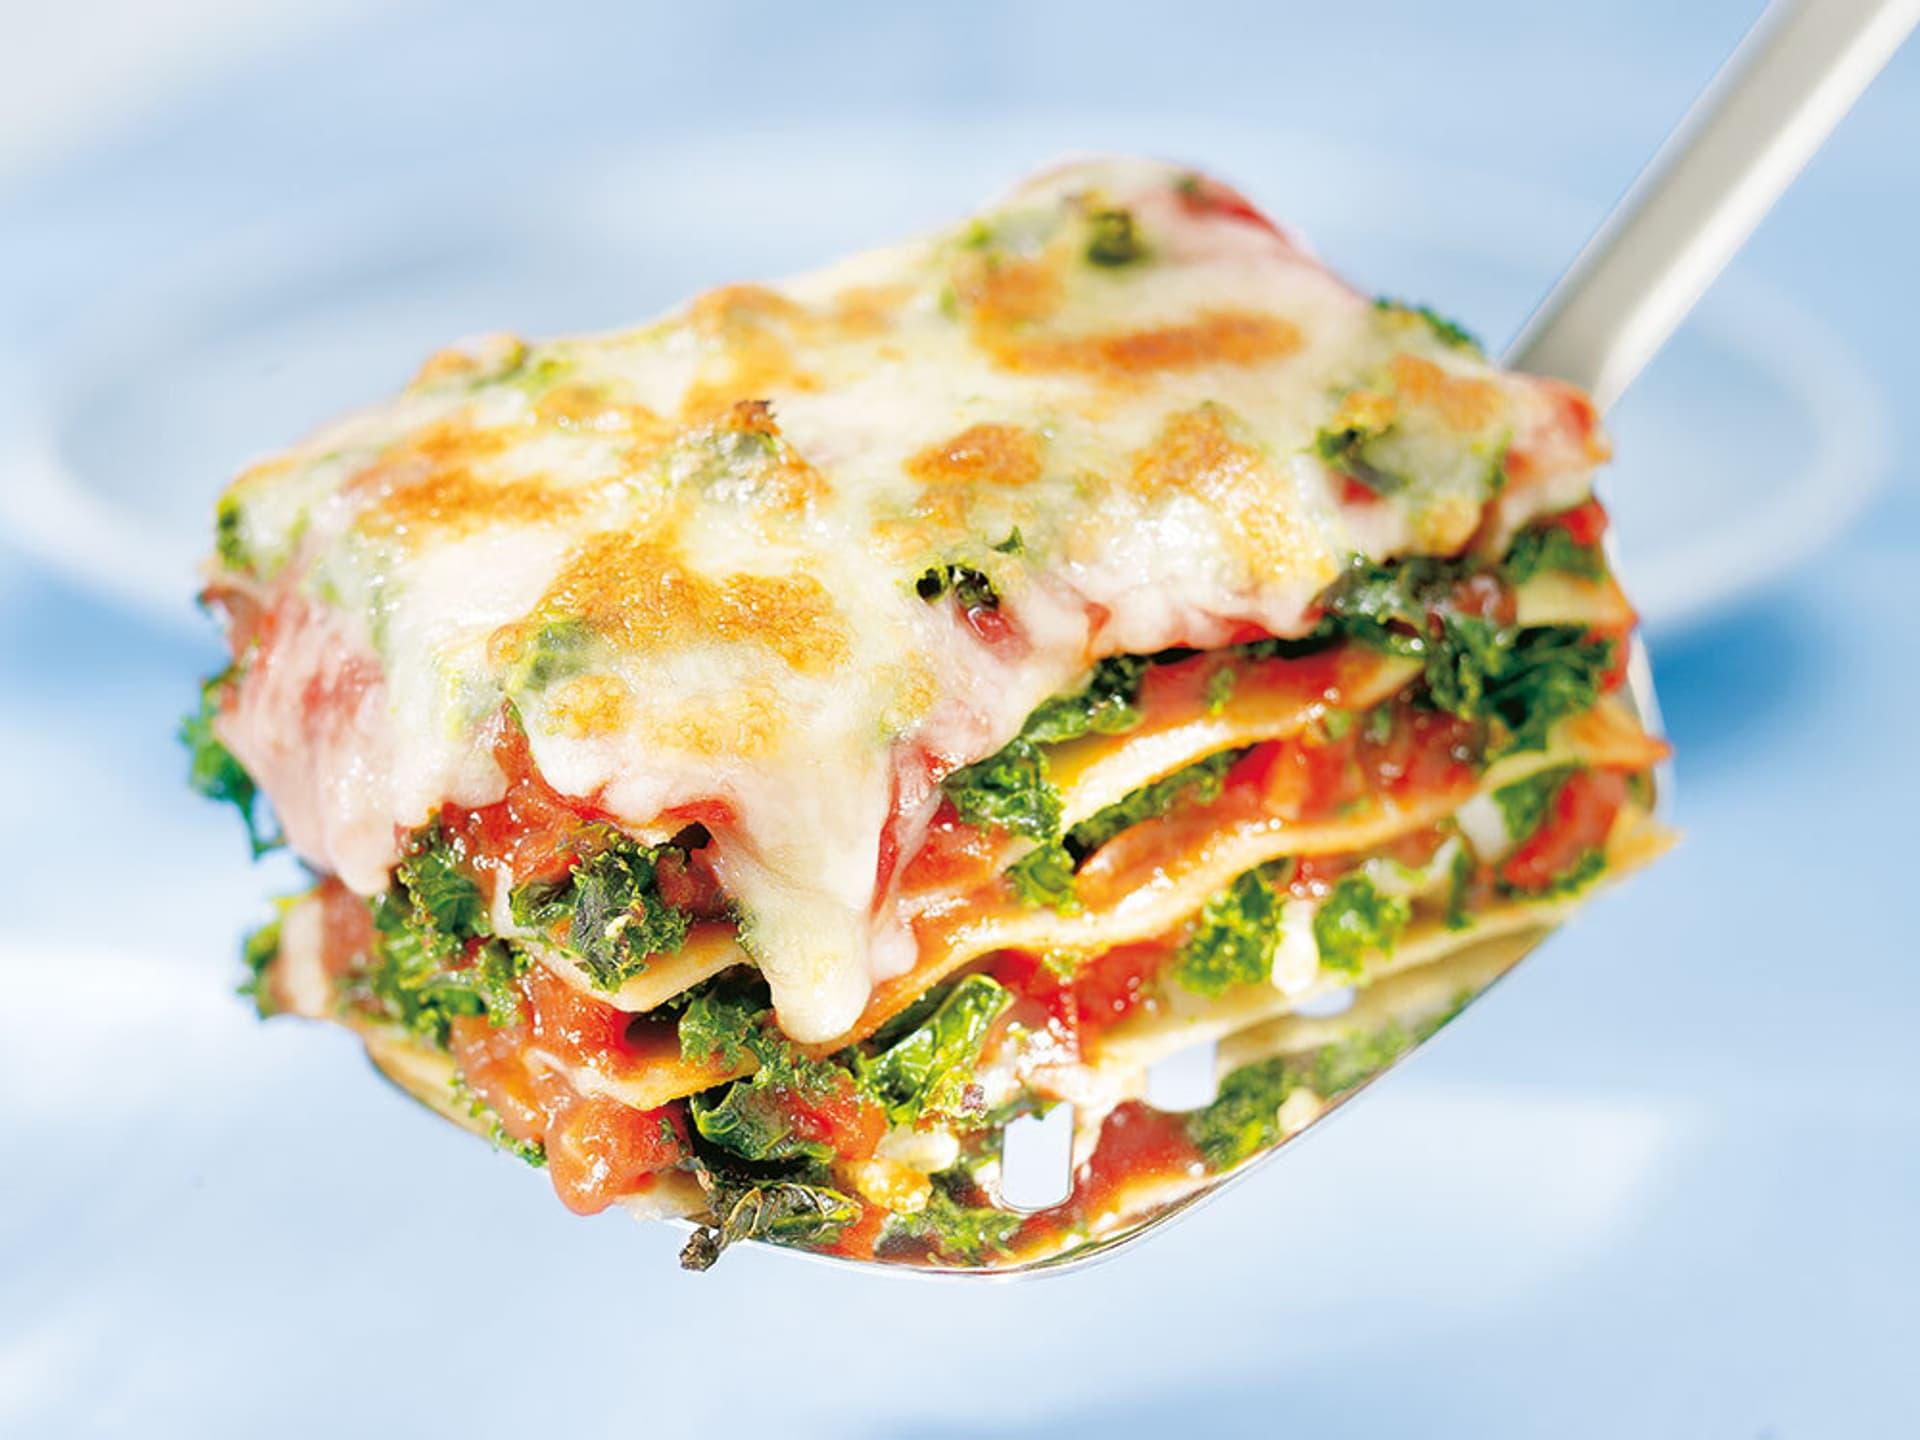 Grünkohl-Lasagne mit Tomatensoße